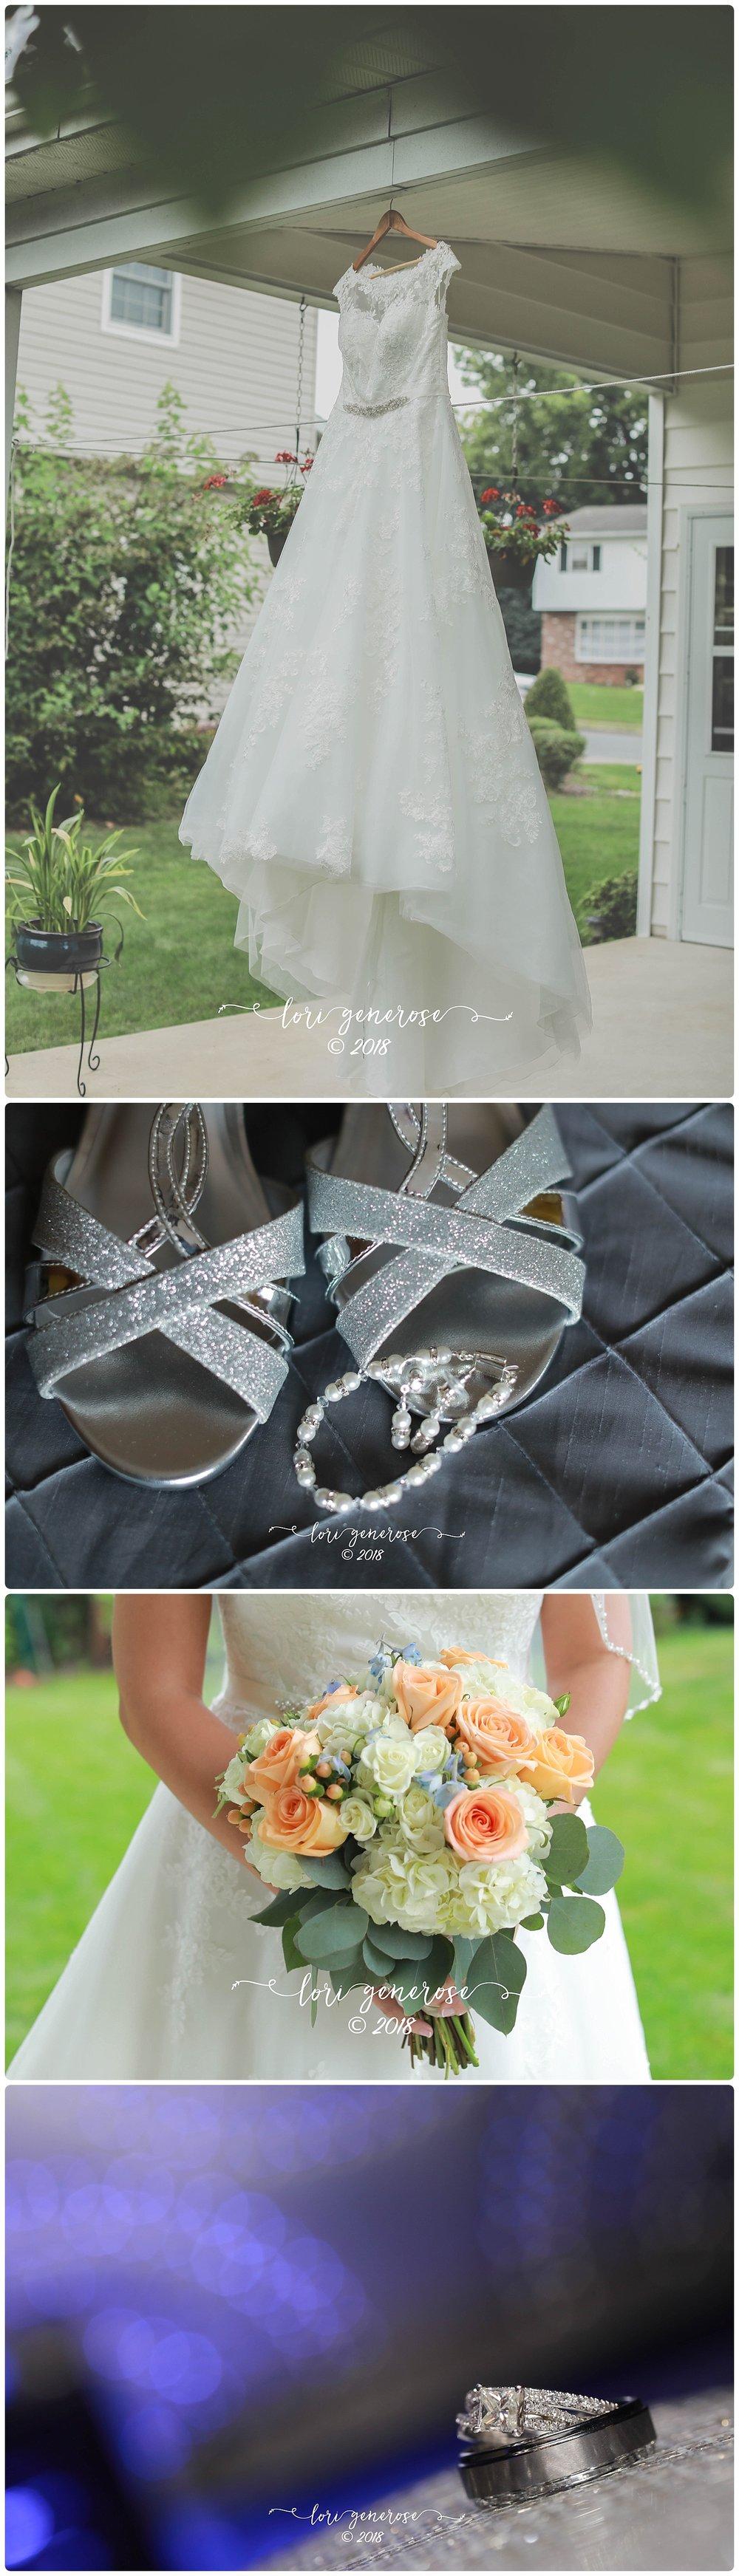 lgphotographylorigenerosebearcreekweddingmacungiepadetailsweddingdressflowersshoesrings.jpg